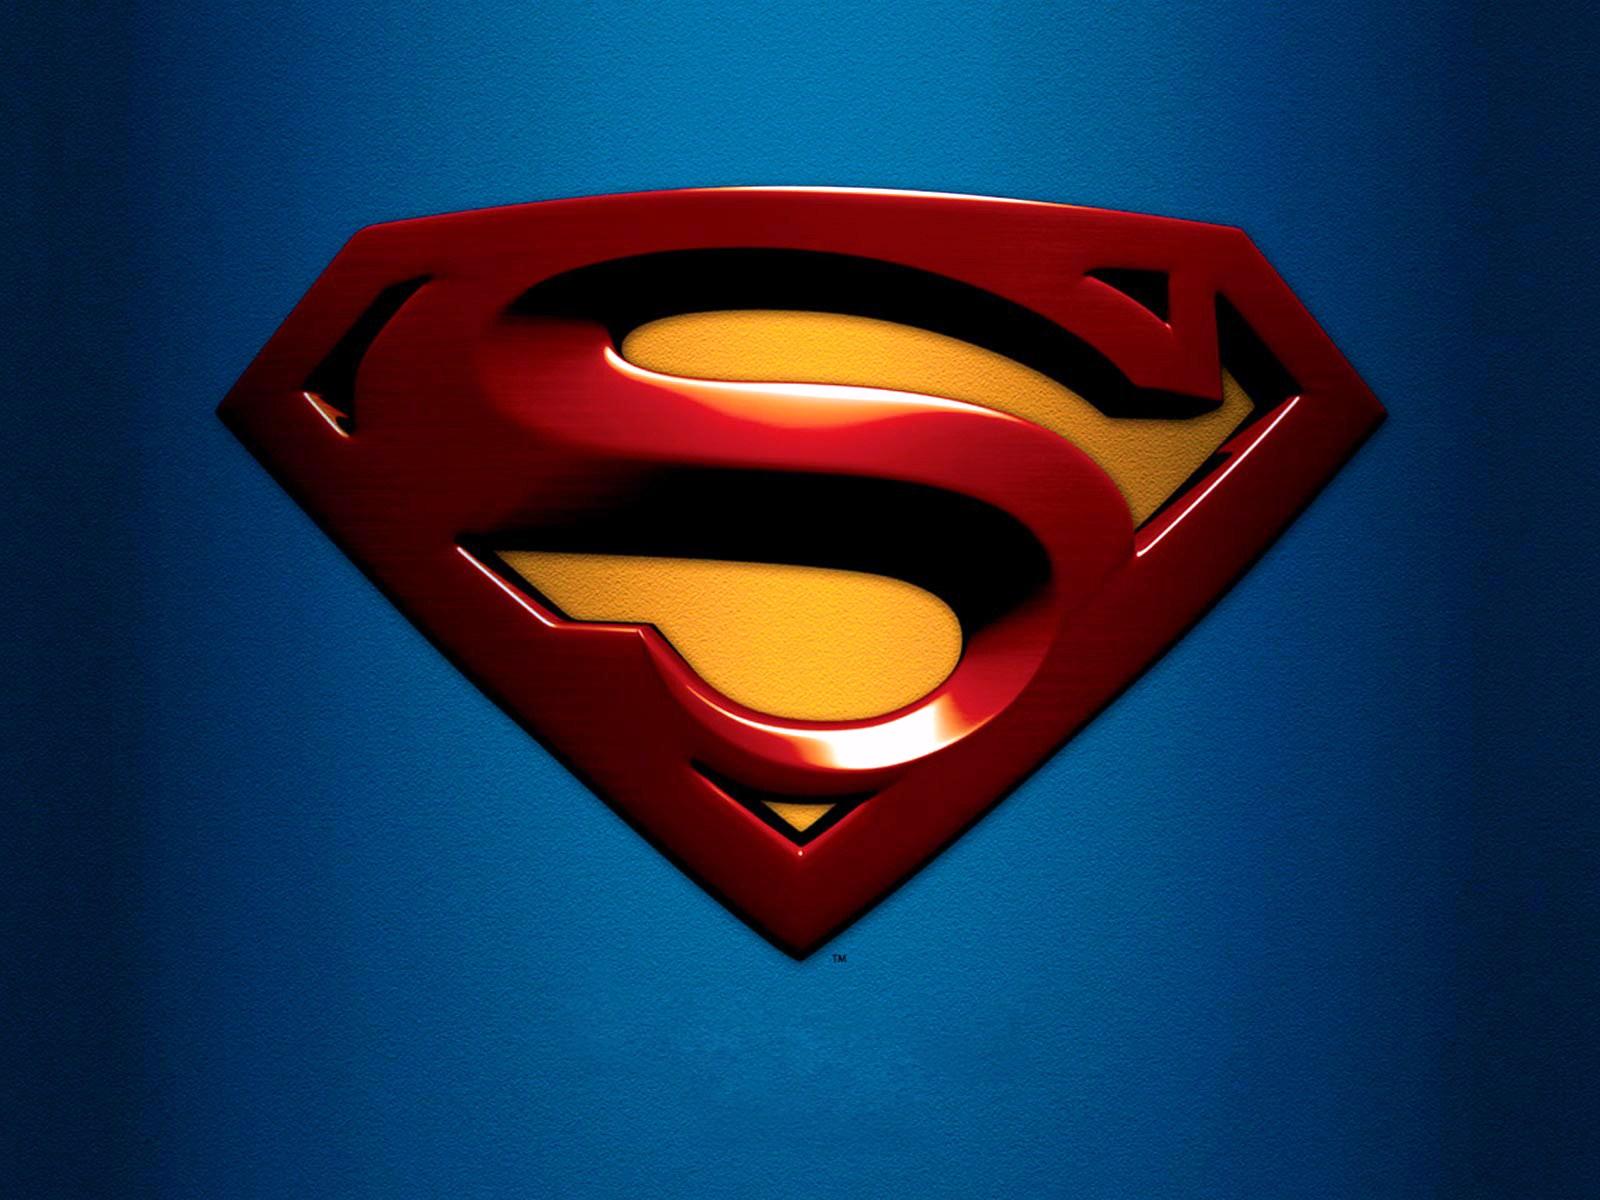 1600x1200px Superman Wallpaper Download 497044 1600x1200